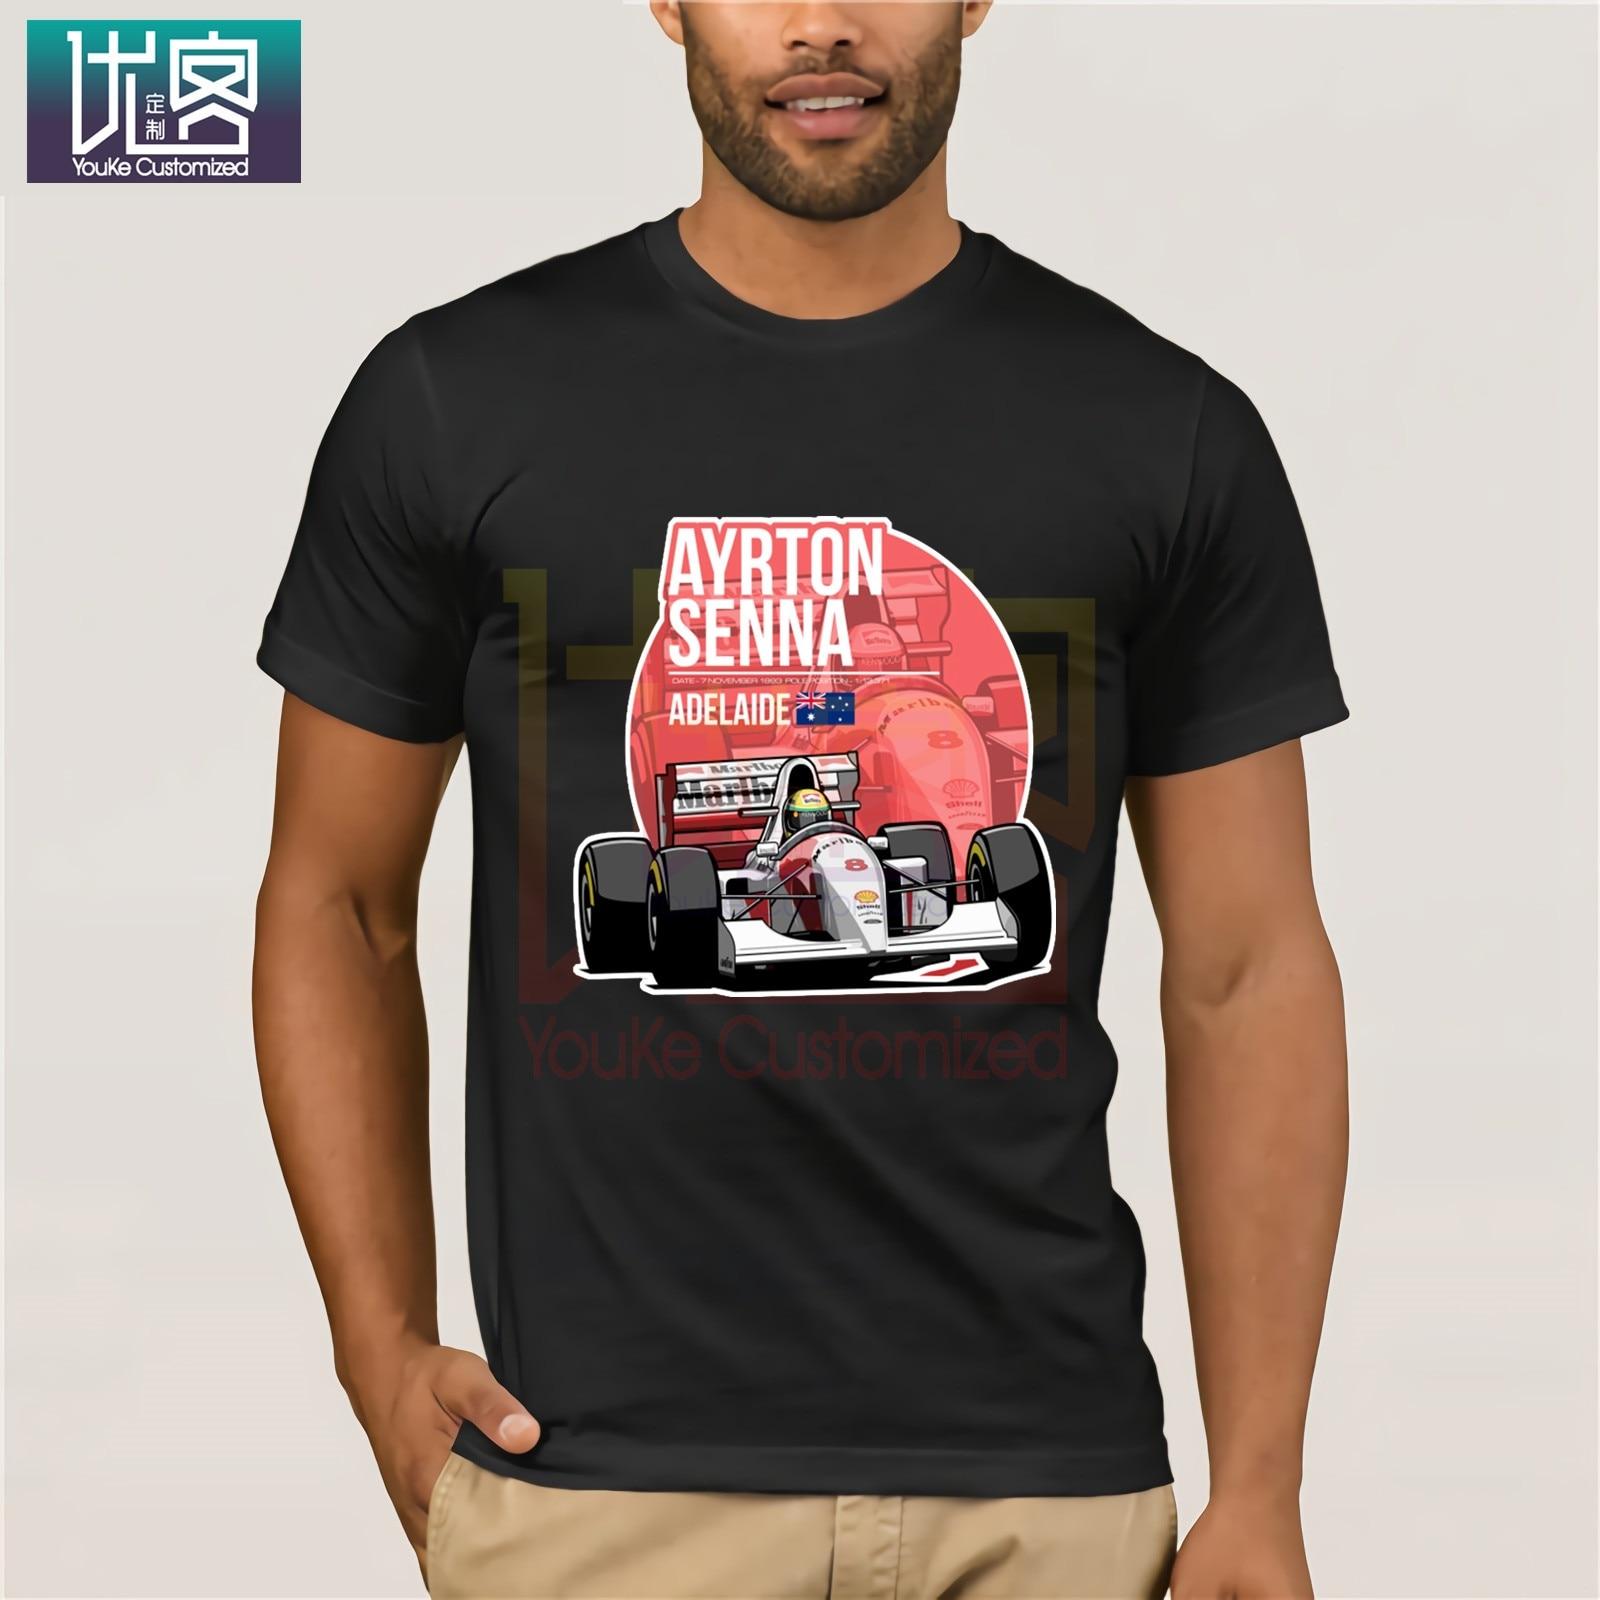 ayrton-font-b-senna-b-font-1993-adelaide-t-shirt-deciren-via-vetements-populaire-t-shirt-col-rond-100-coton-t-shirts-vintage-col-rond